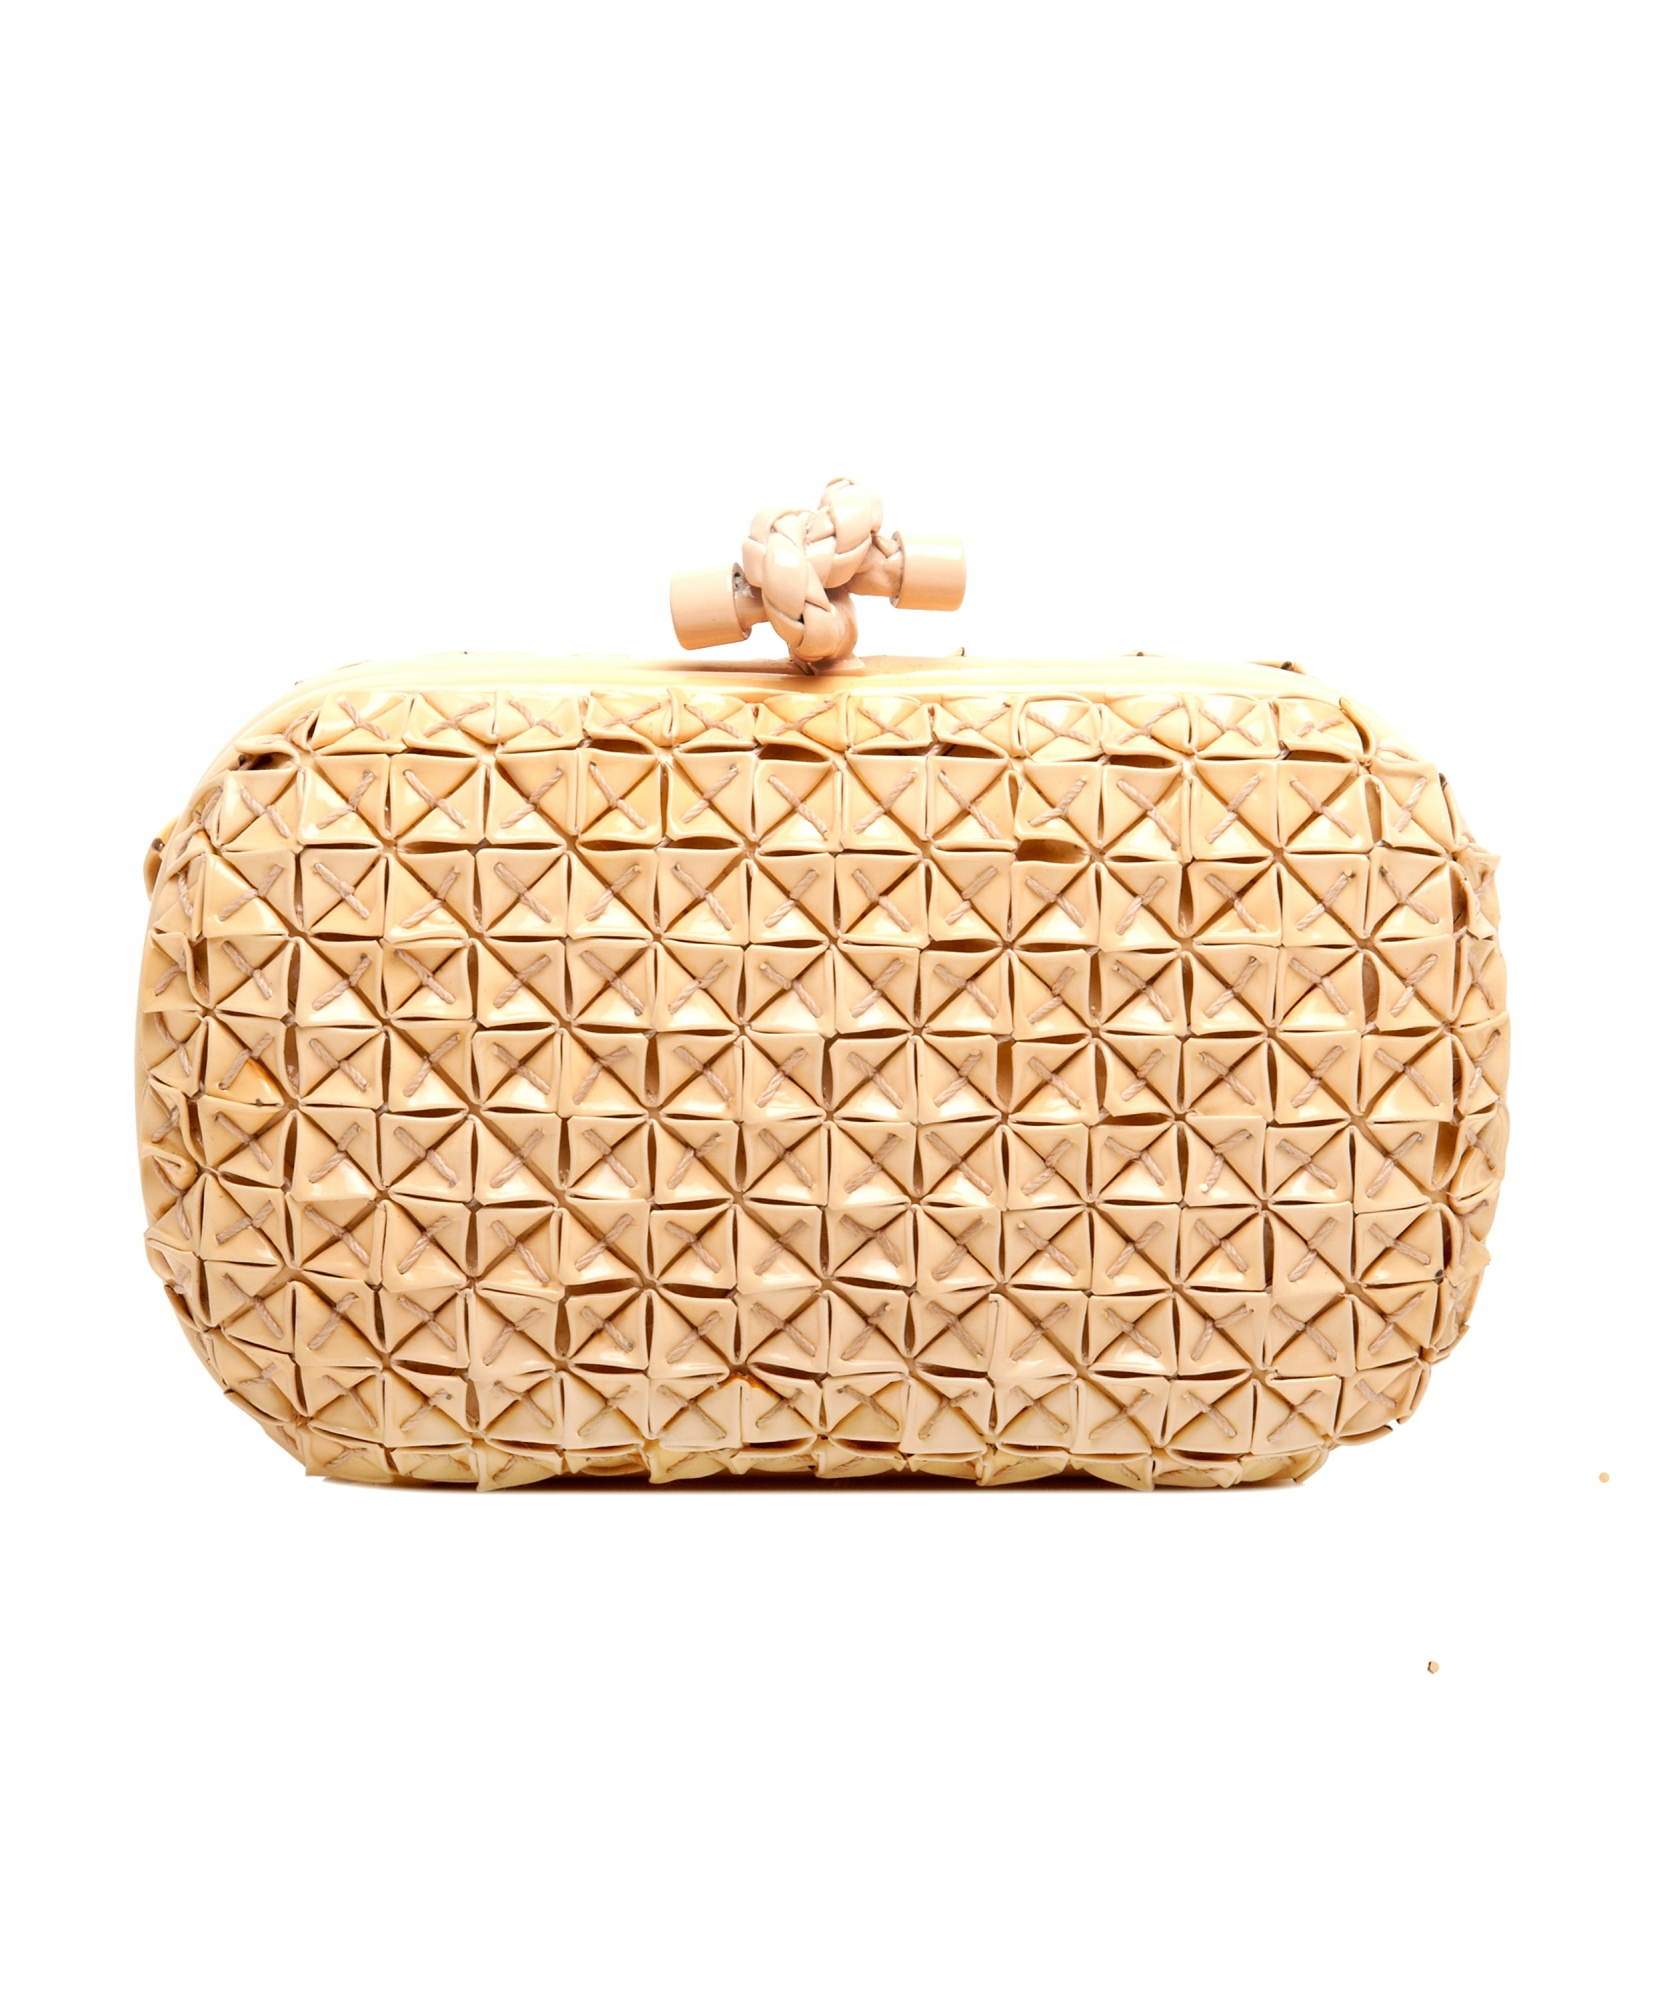 3606d95ea2470 Bottega Veneta Origami Knot Clutch - Limited Edition   La Doyenne